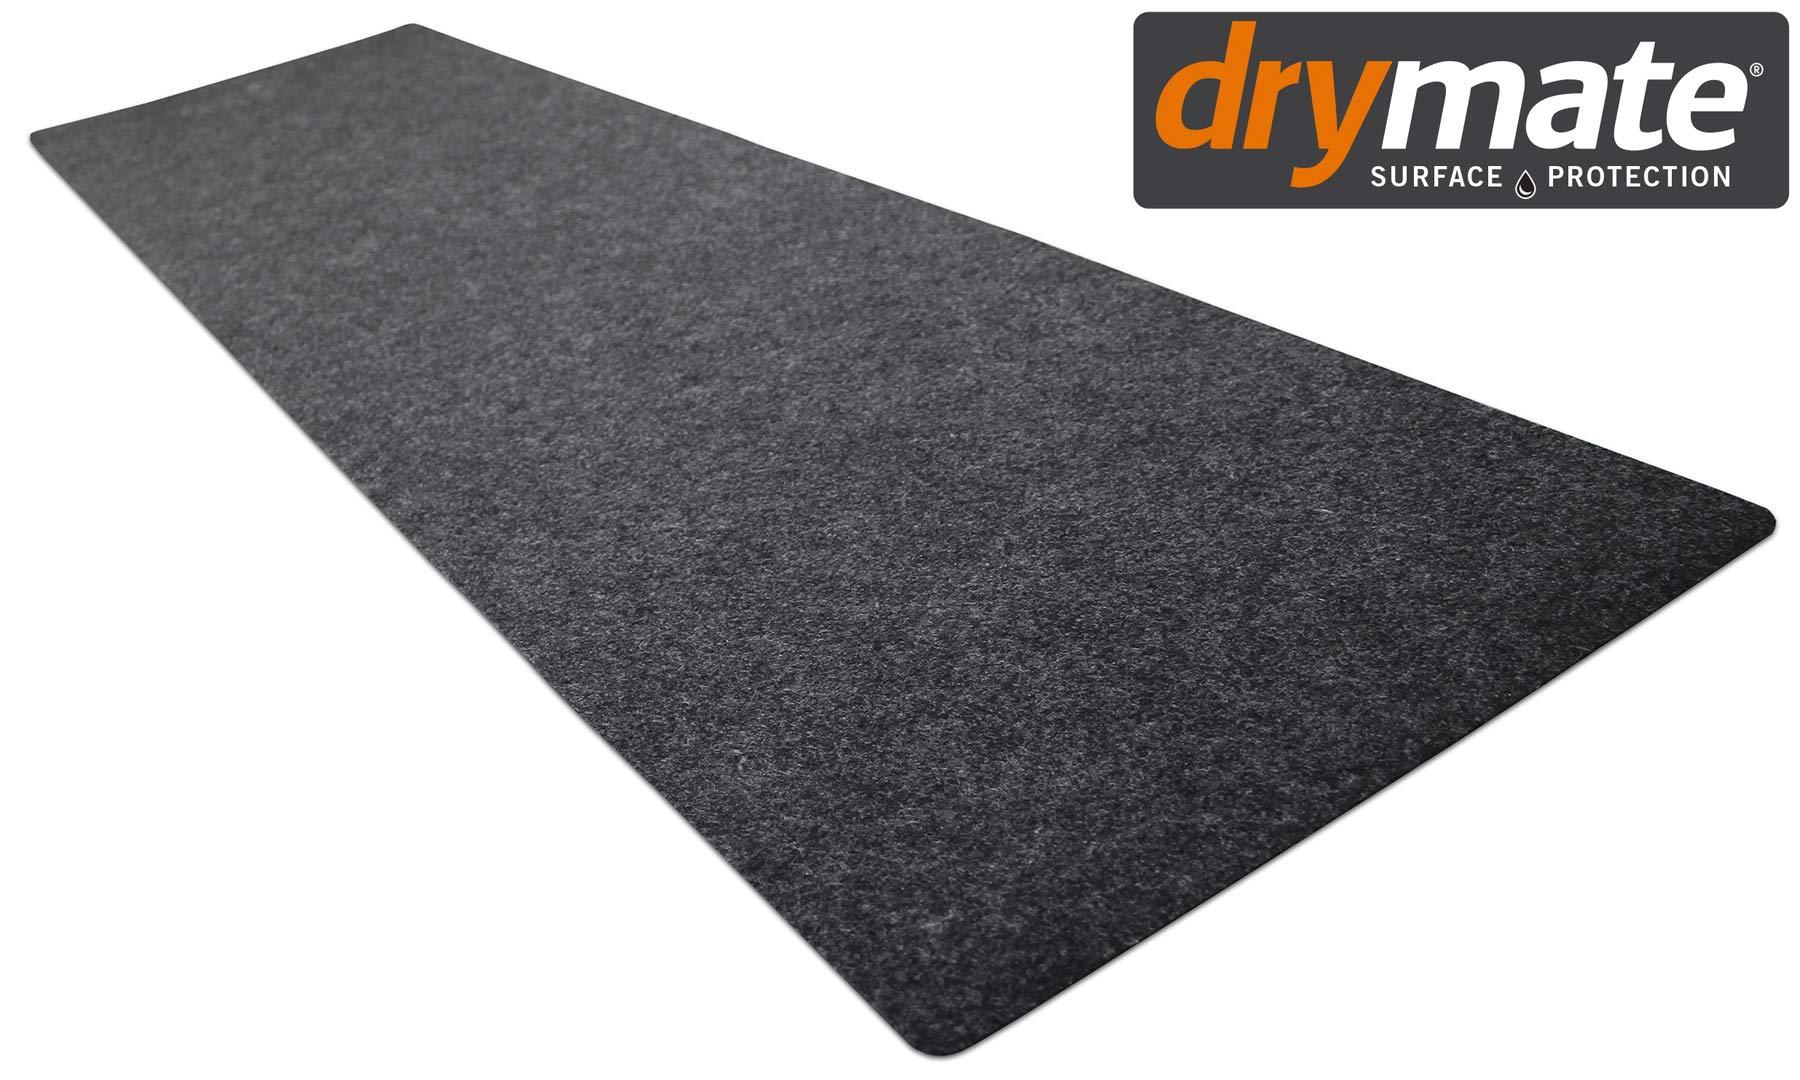 Drymate Gun Cleaning Pad Premium